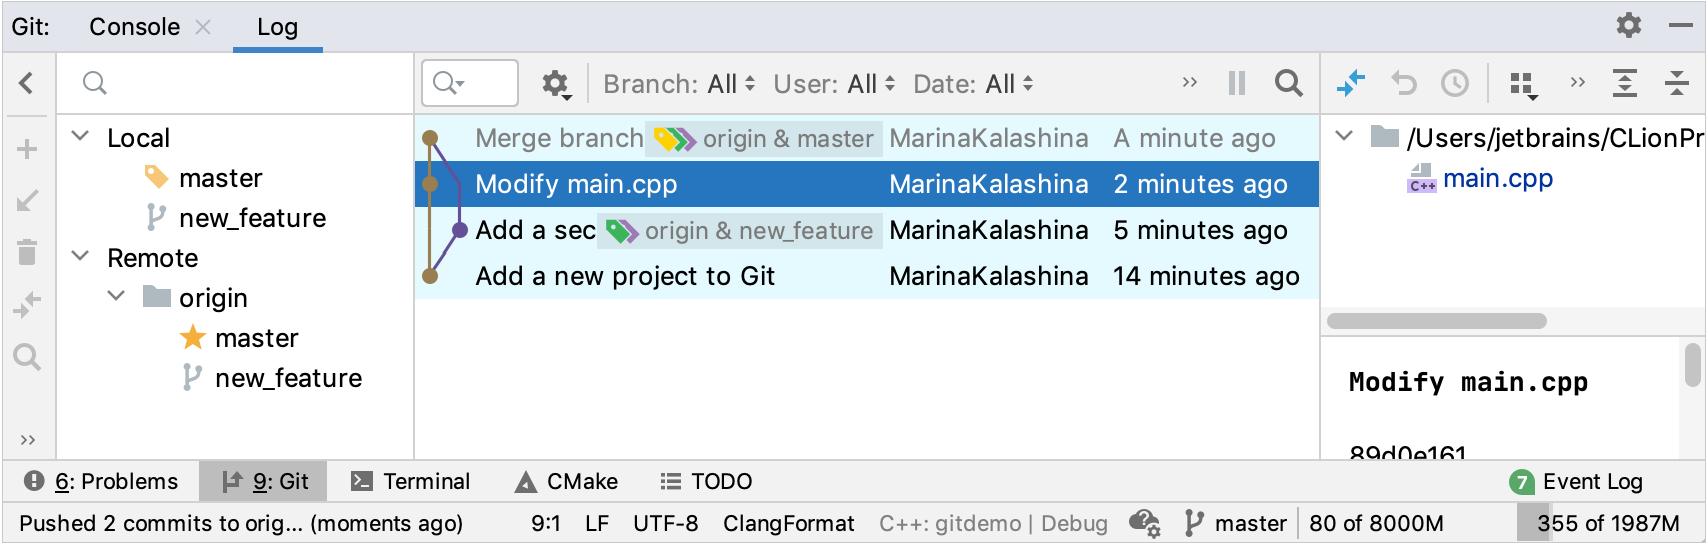 The Git Log tab